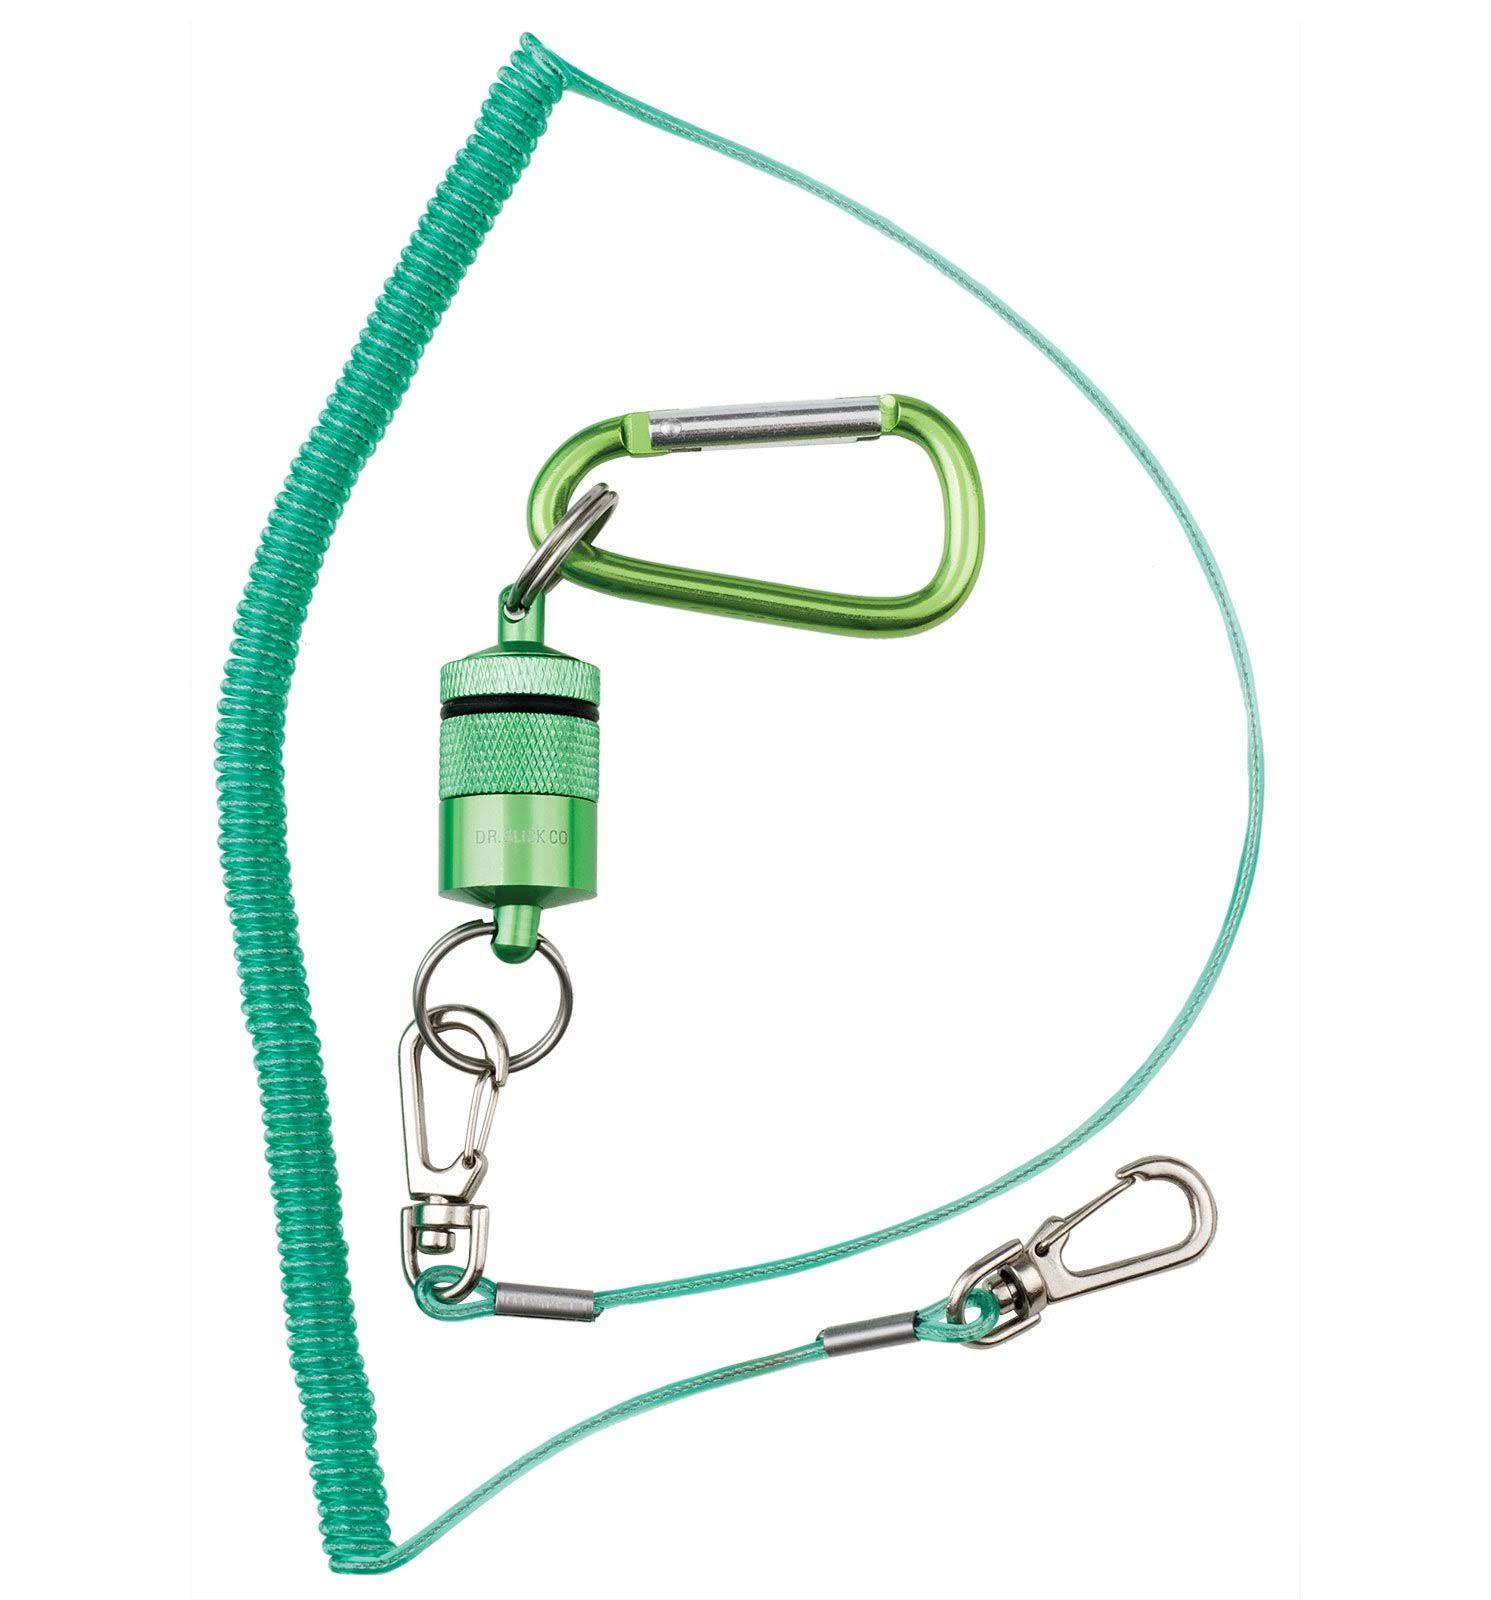 Dr. Slick - Magnetic Net Holder